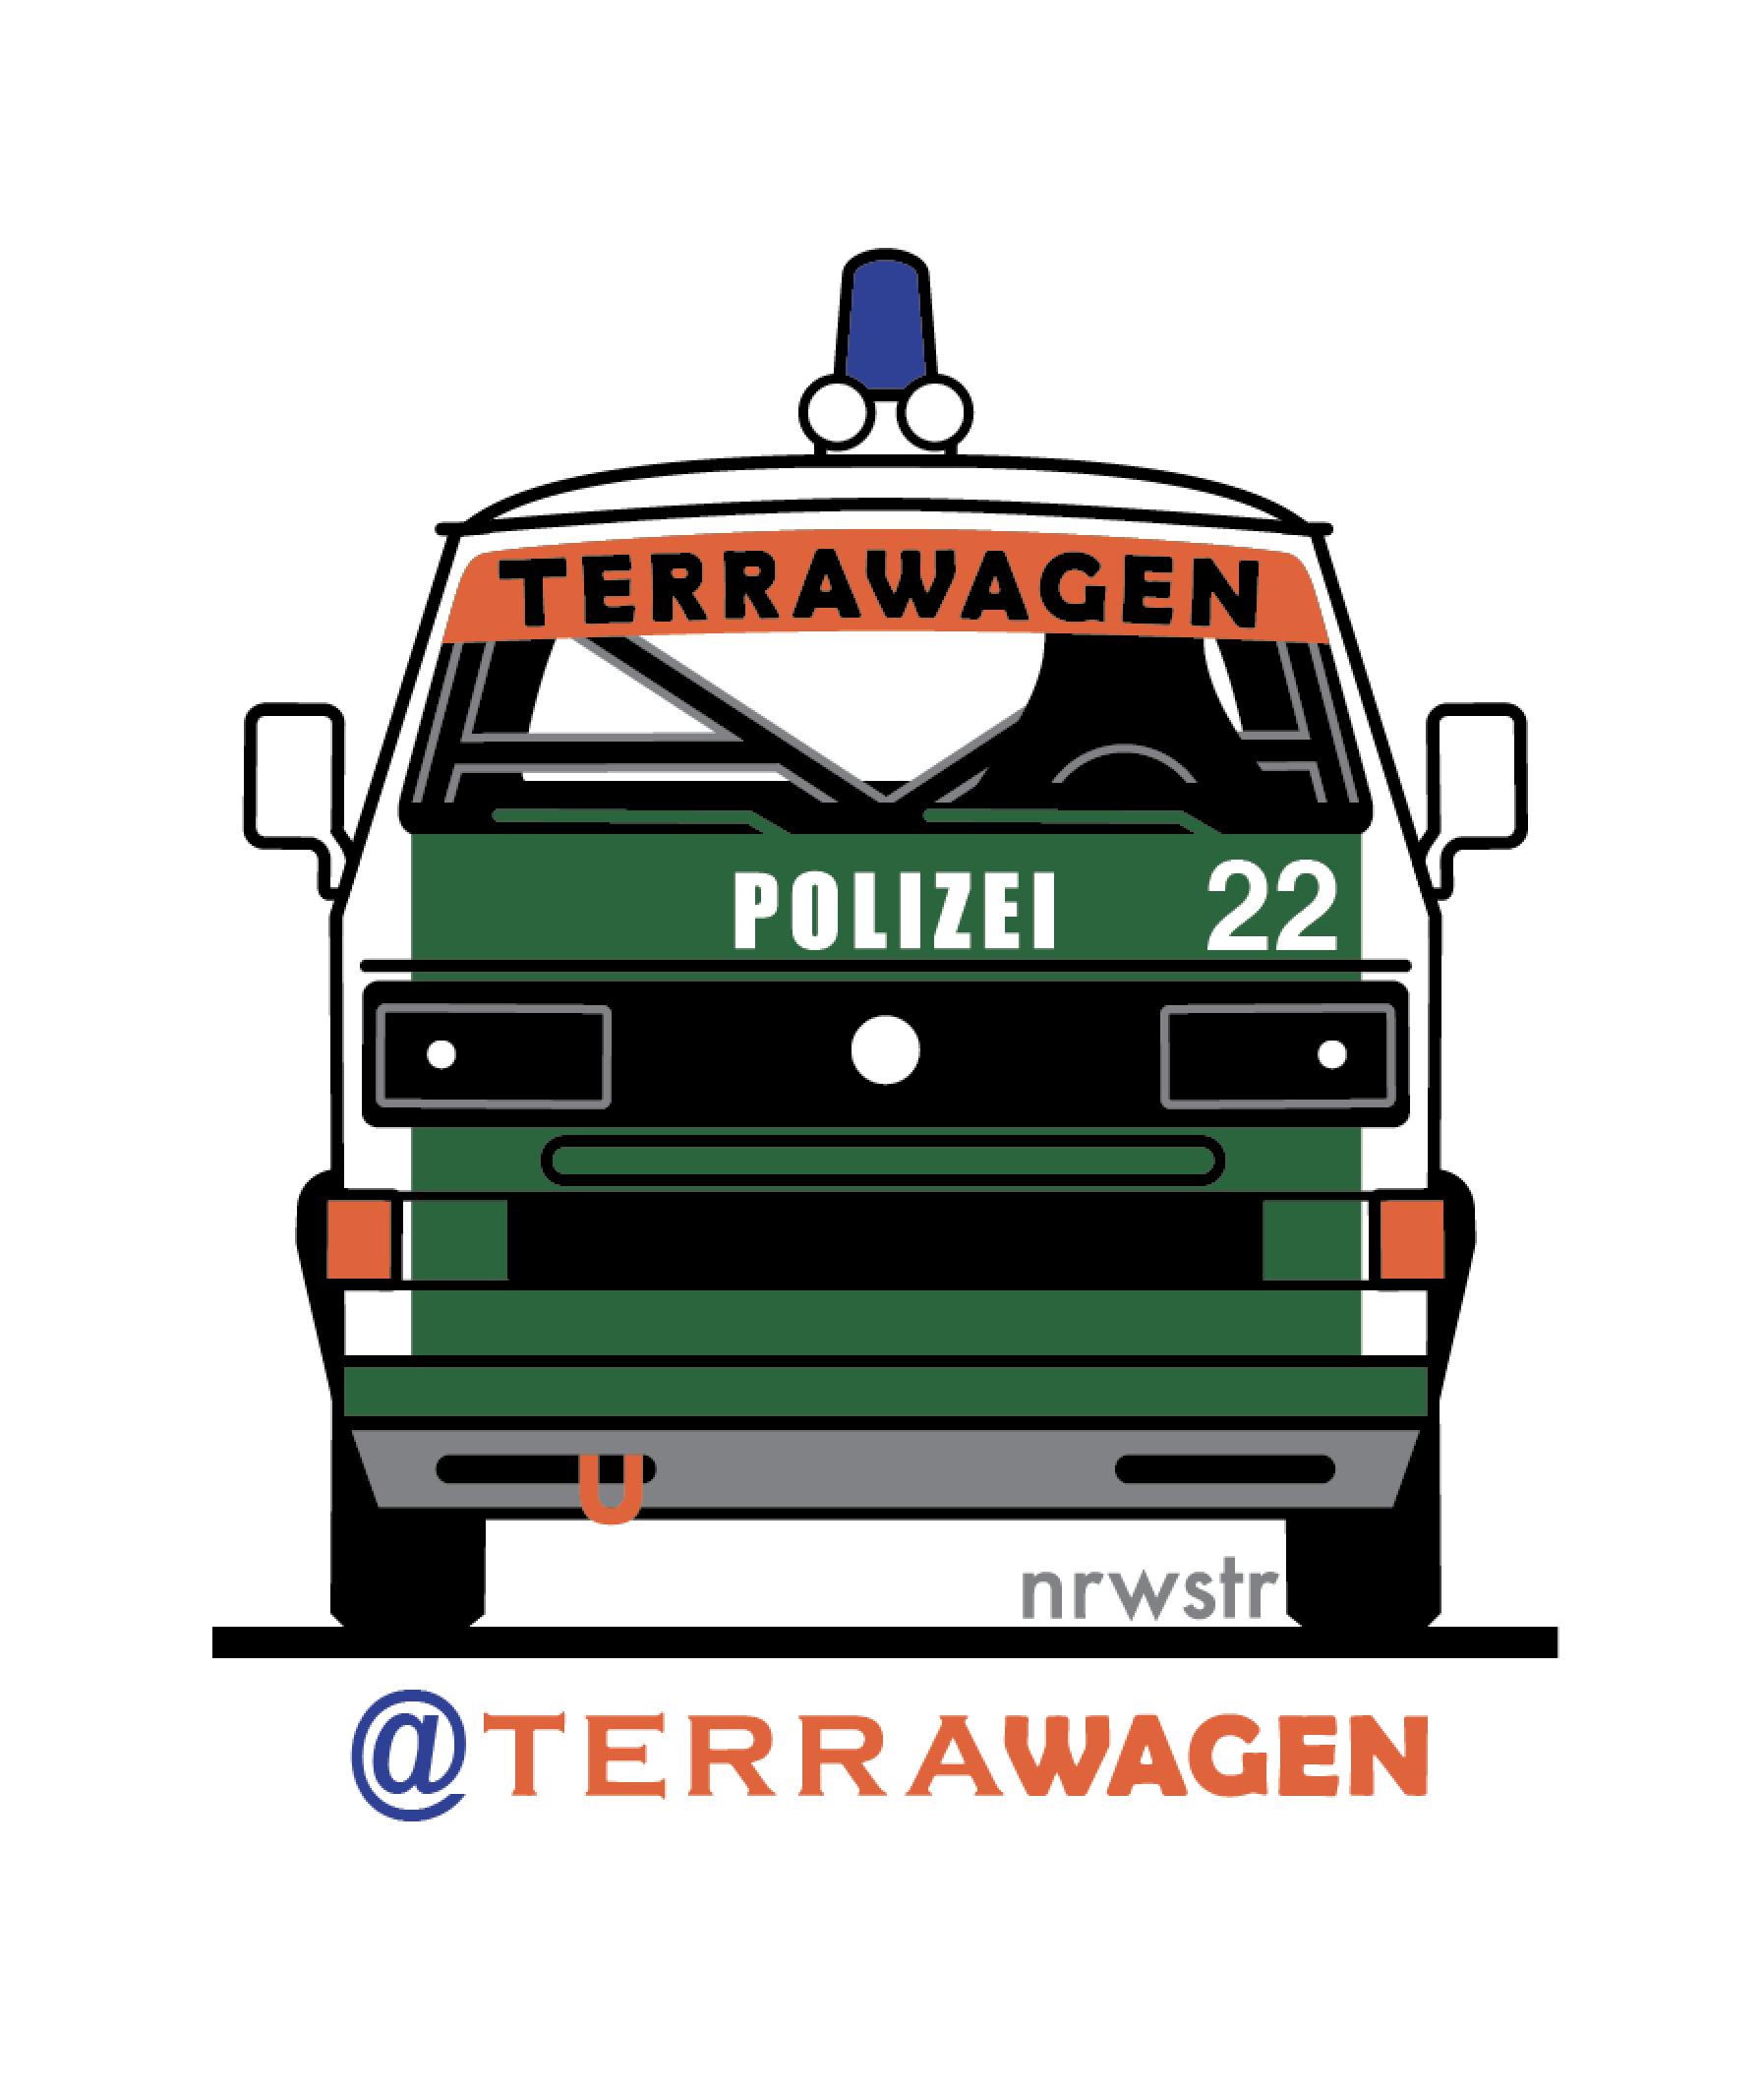 terrawagen polizei front view.png